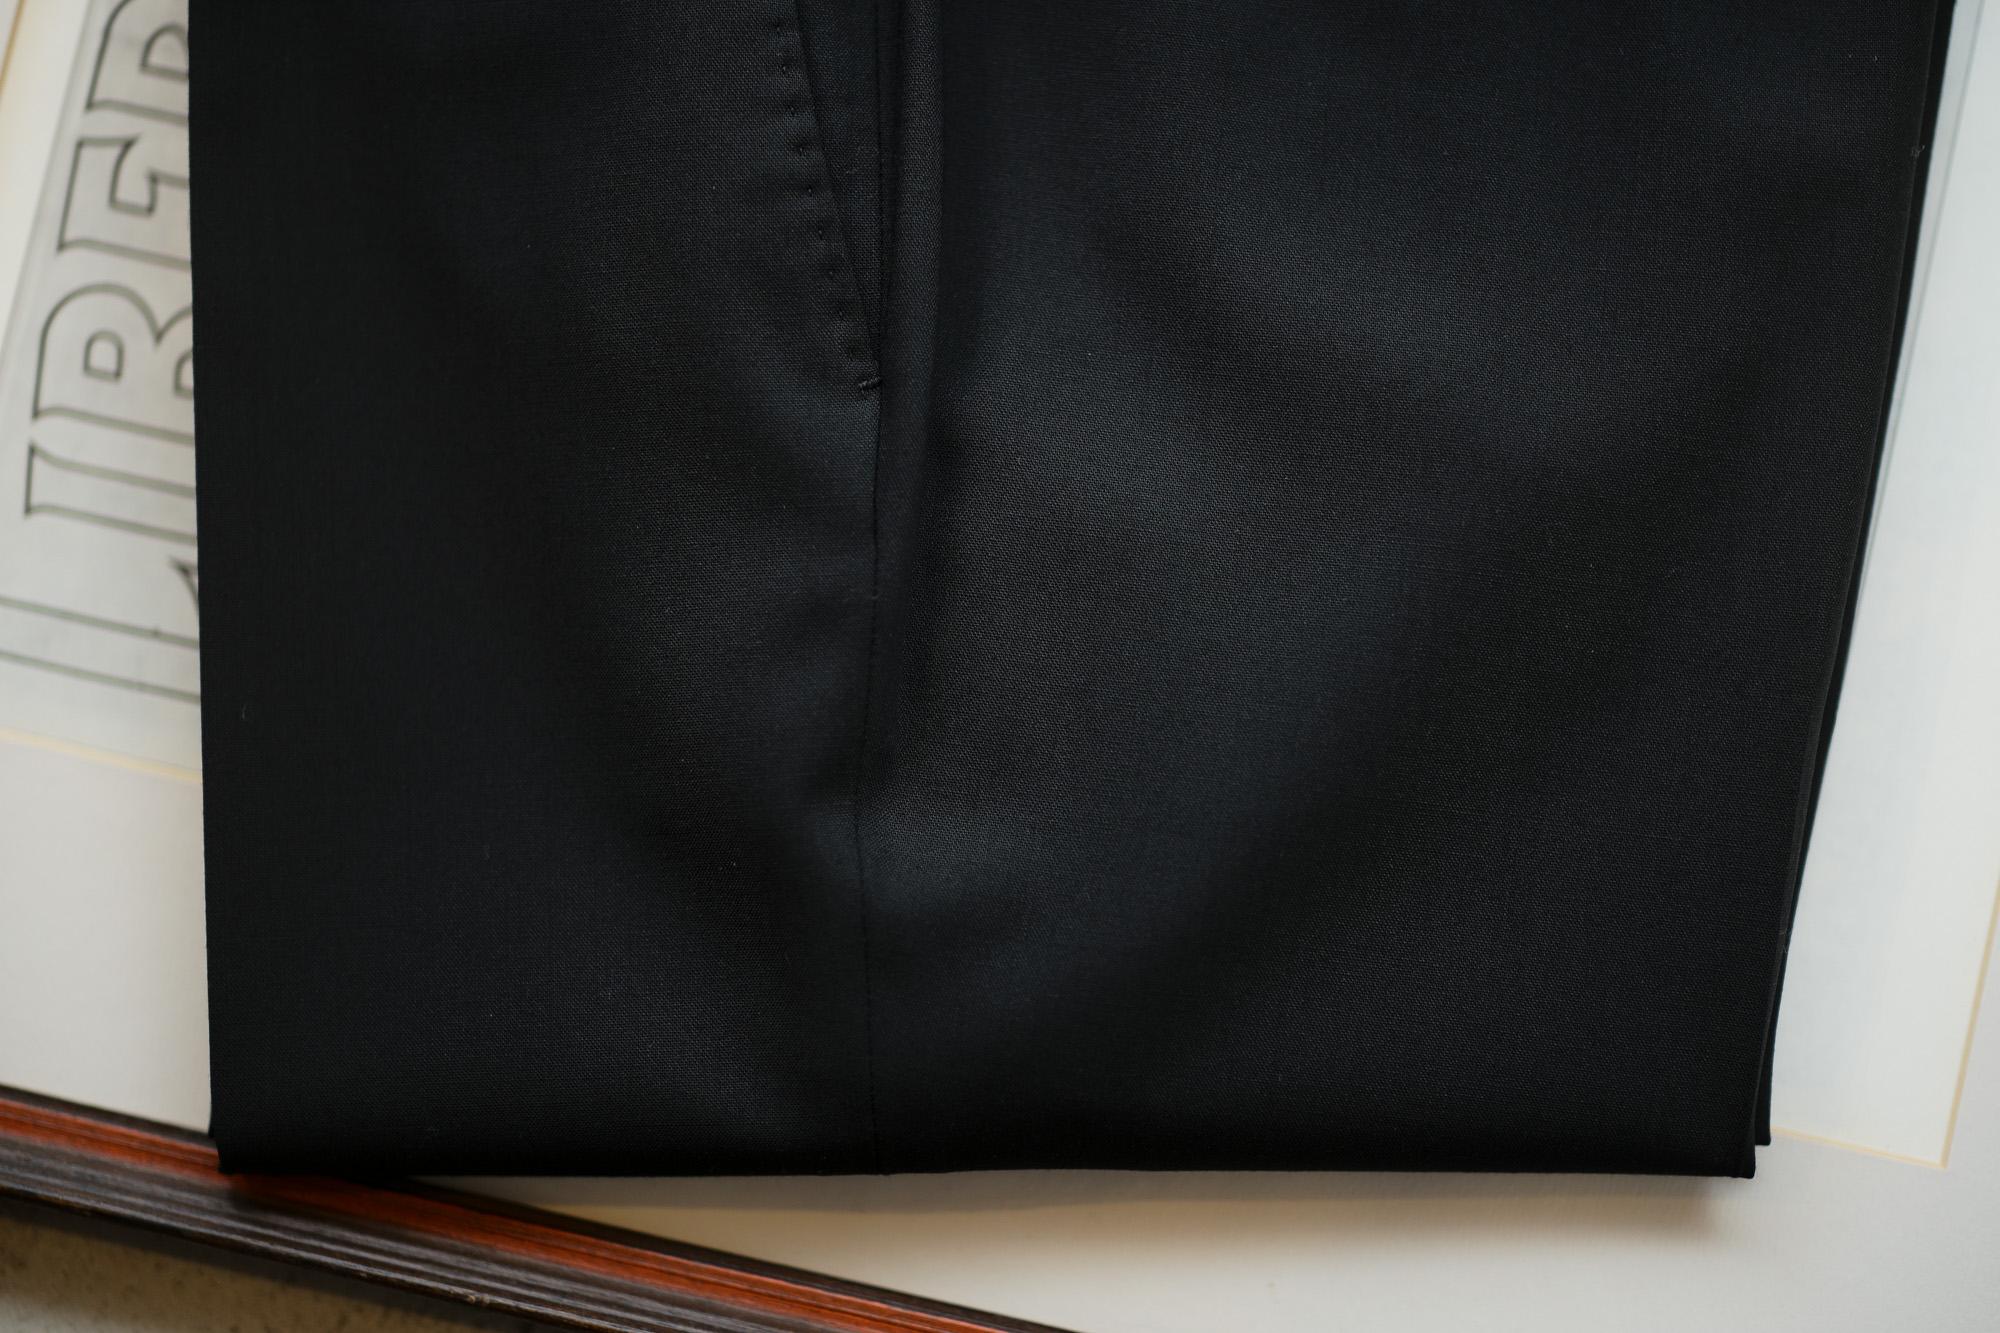 INCOTEX (インコテックス) N35 SLIM FIT (1NG35N) URBAN TRAVELER 撥水 ウォッシャブル トロピカルウール サマーウール スラックス BLACK (ブラック・990) 2019 春夏新作 愛知 名古屋 altoediritto アルトエデリット